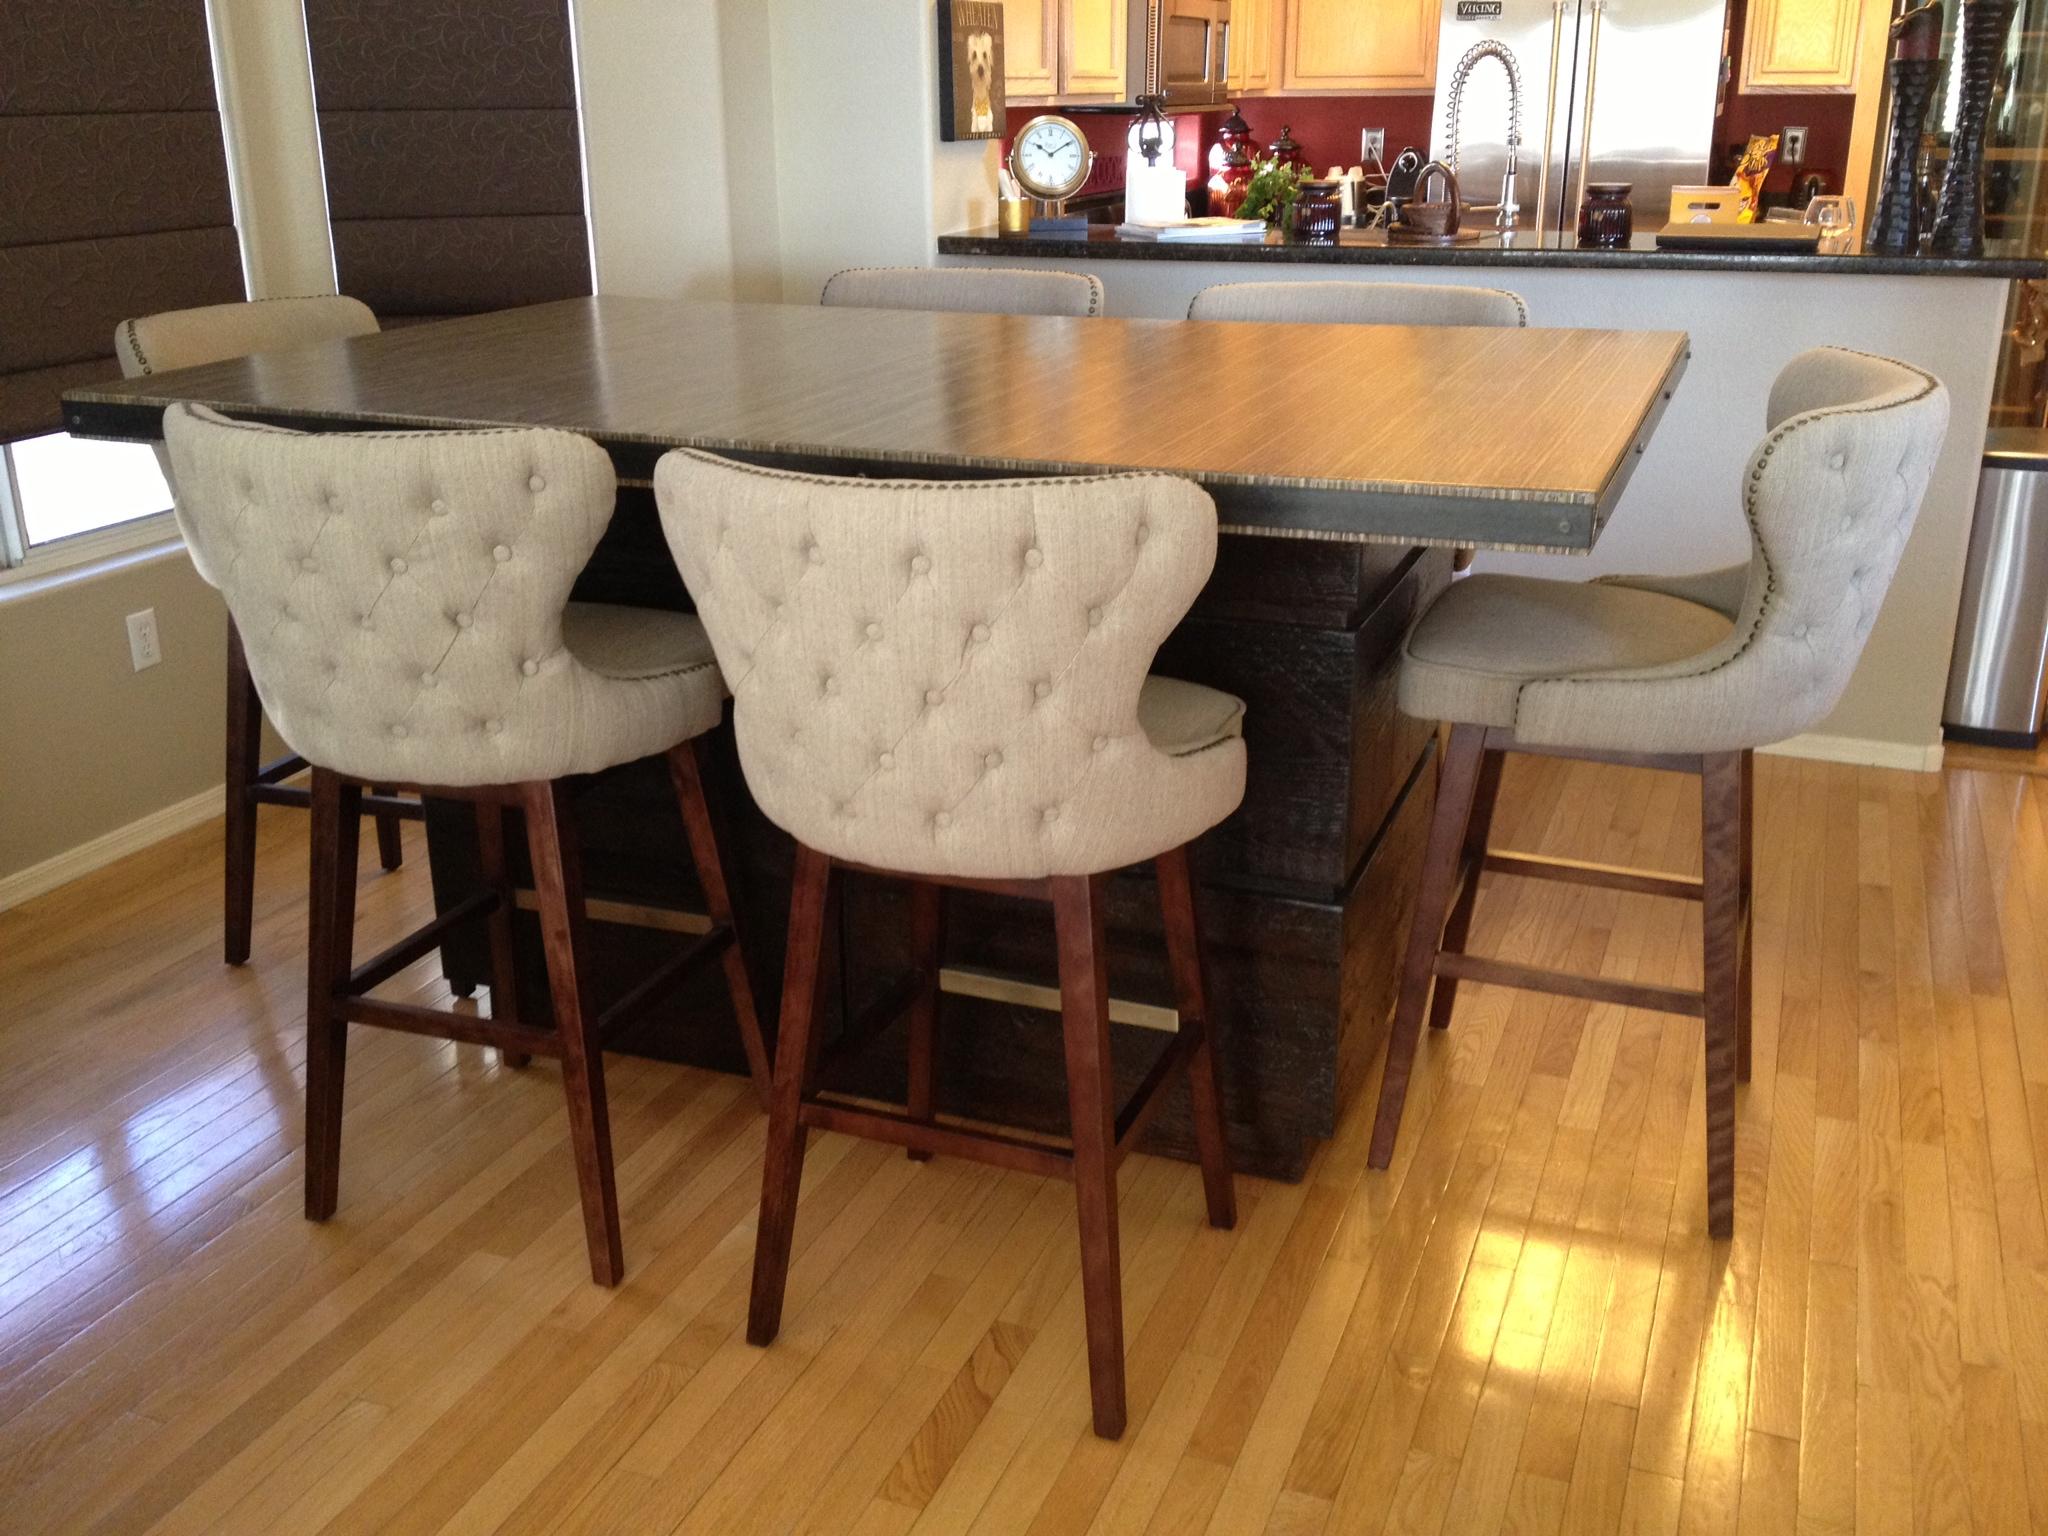 custom kirei kitchen table skg design kitchen table las vegas Urban Woods SKG Kirei and reclaimed wood kitchen table